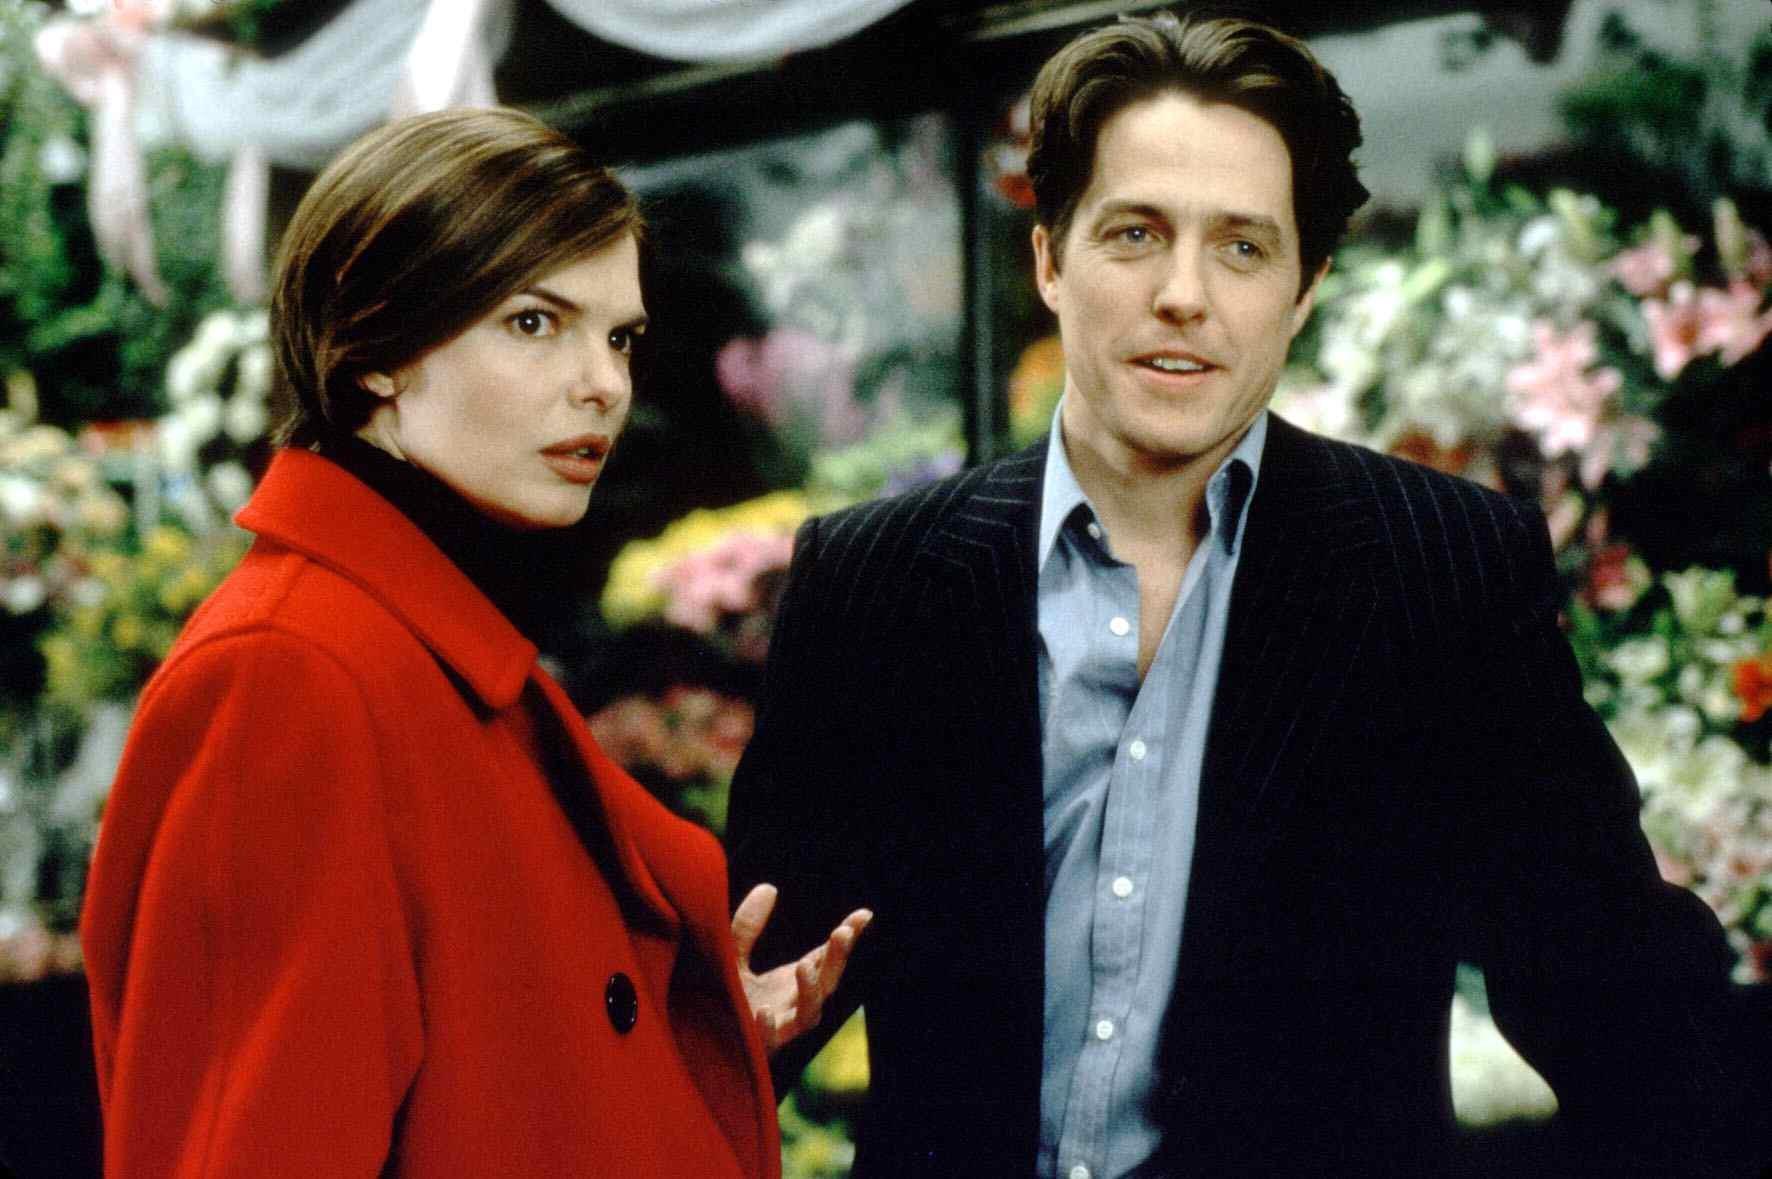 Scena iz filma 'Za tvoje plave oči', 1999. godina